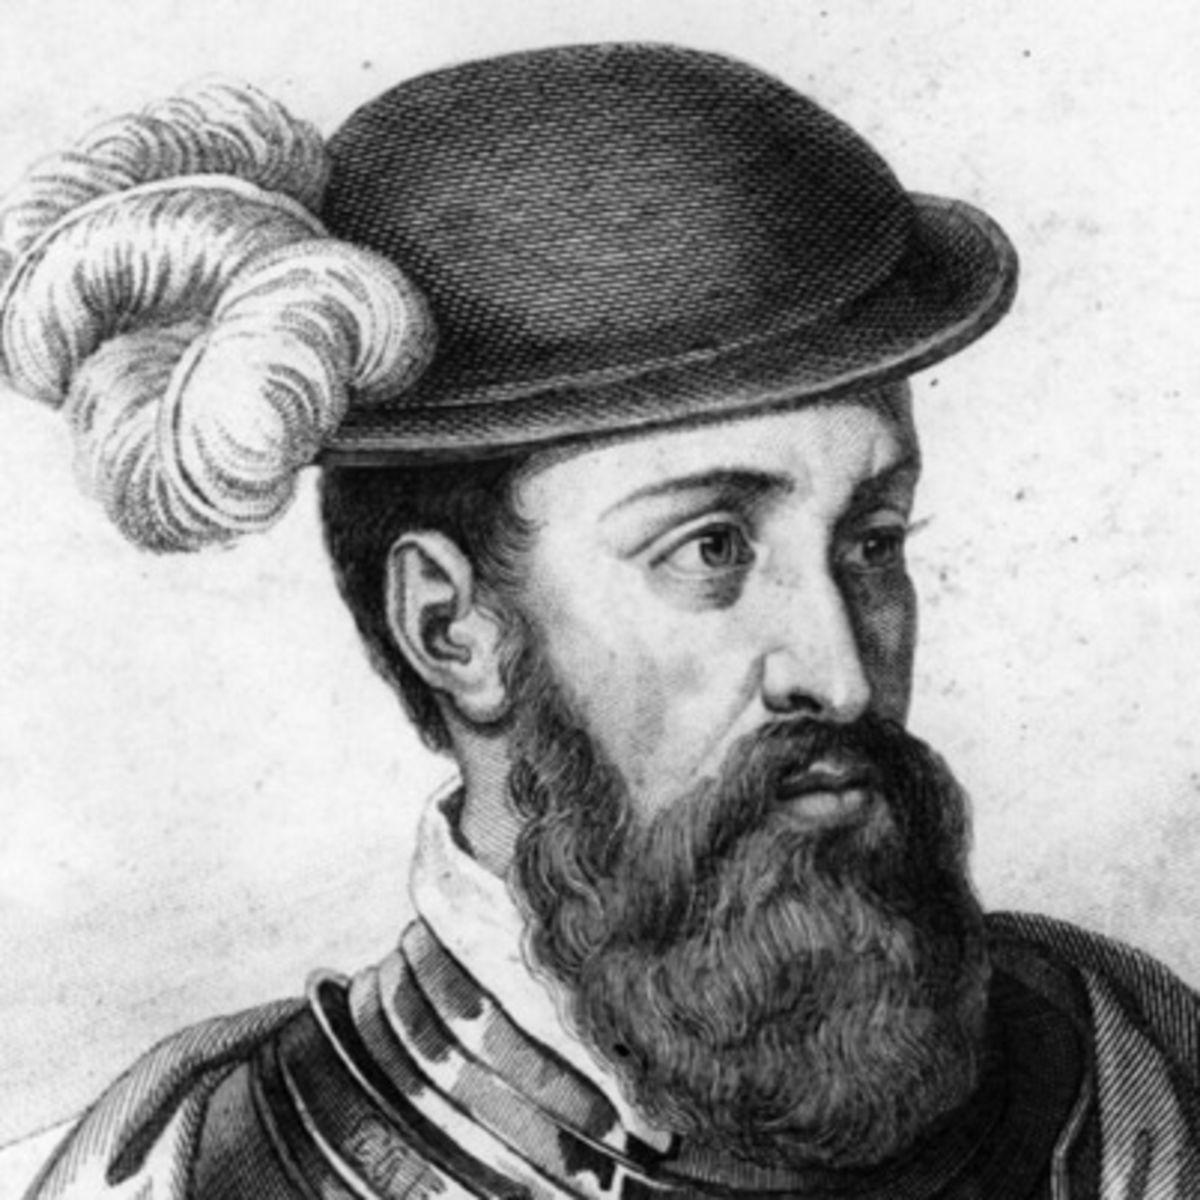 Francisco Pizarro, Peru topraklar�n� ele ge�iren ispanyol(DY-1475) tarihte bug�n